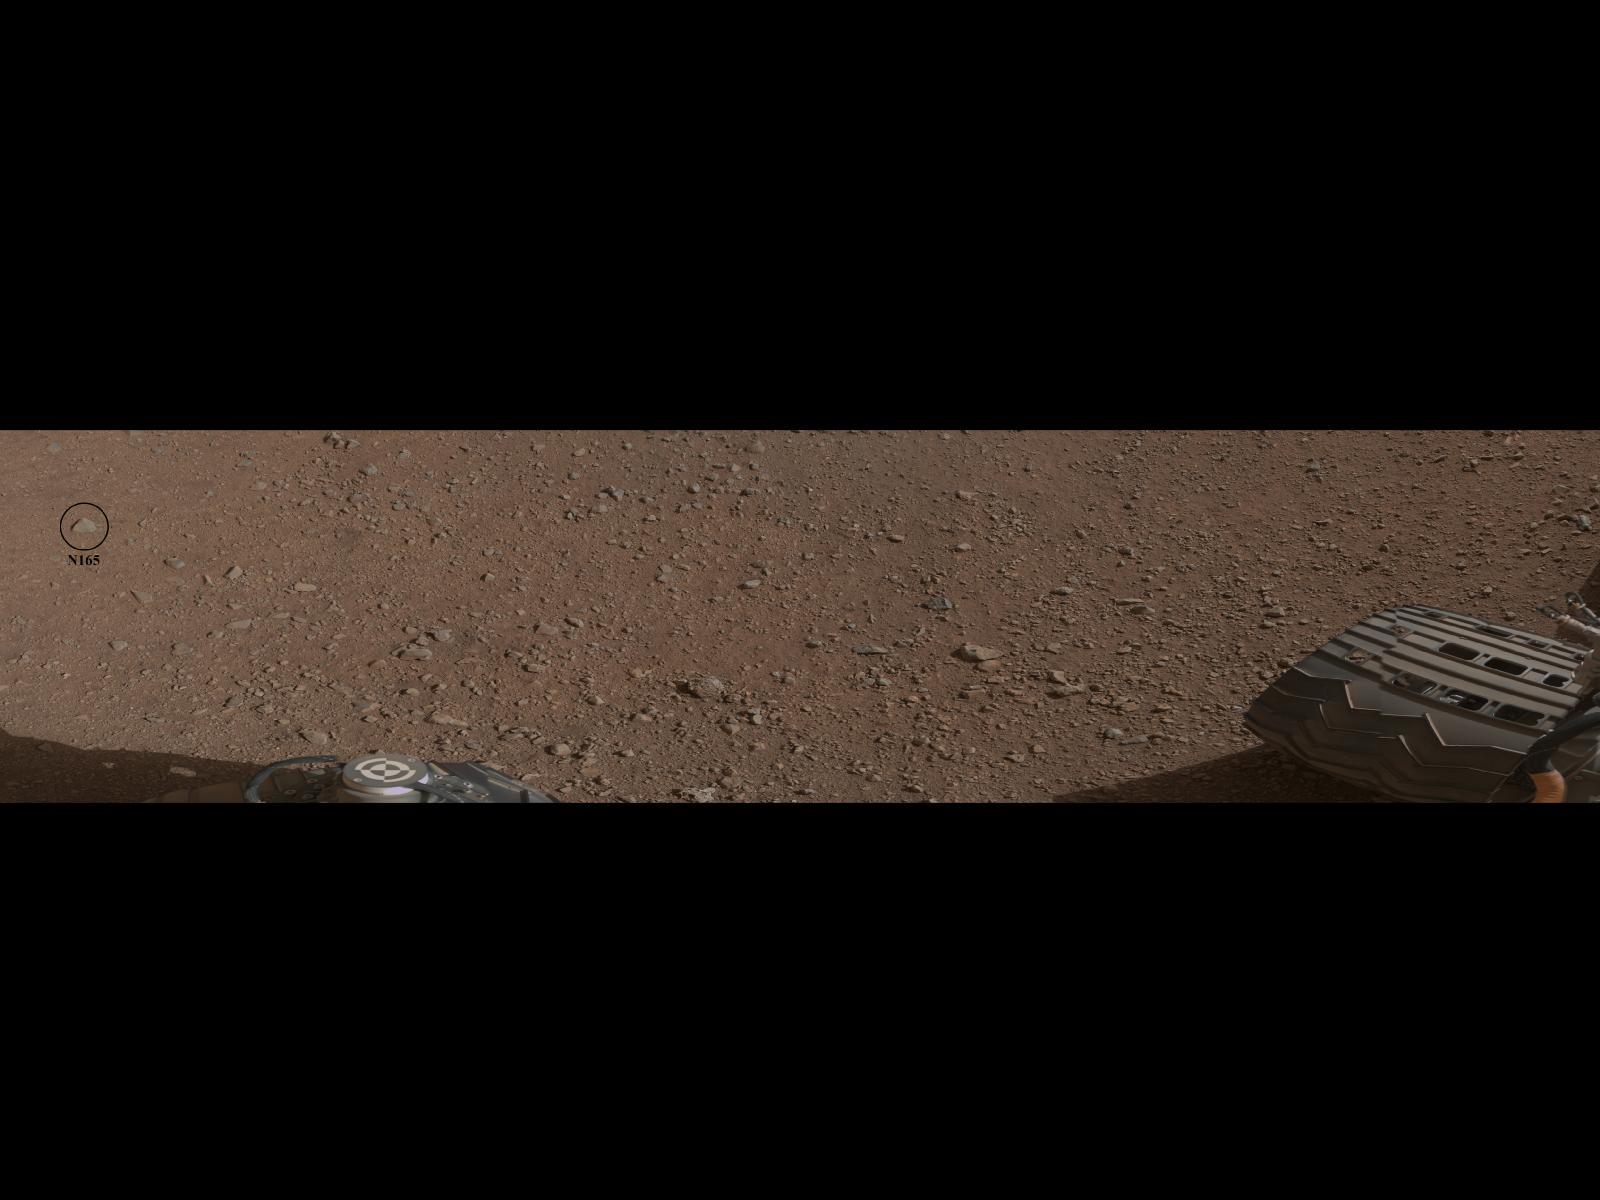 mars rover laser camera - photo #17